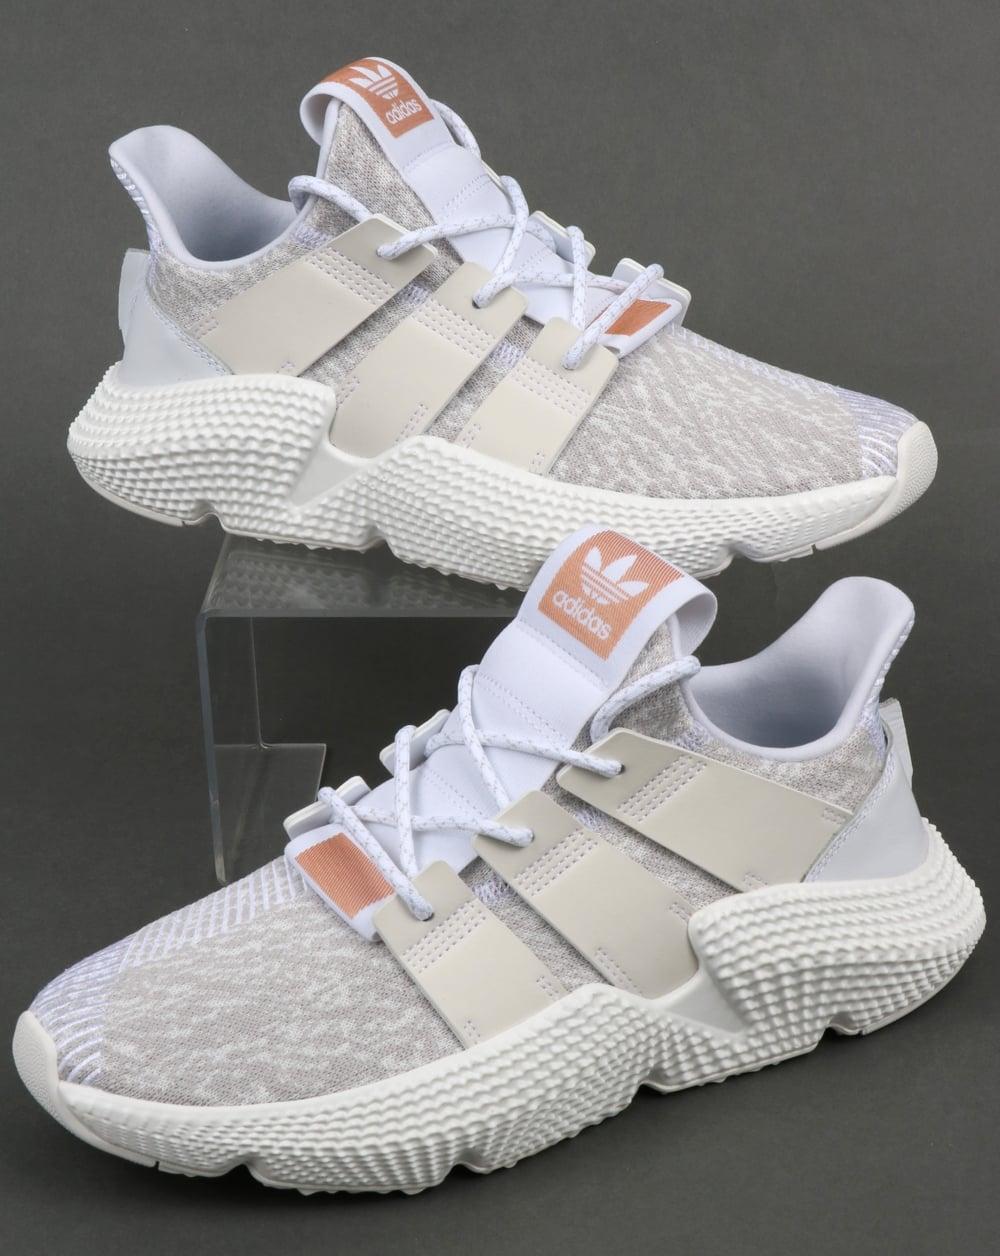 4ba73ad7963e96 Adidas Prophere Trainers White